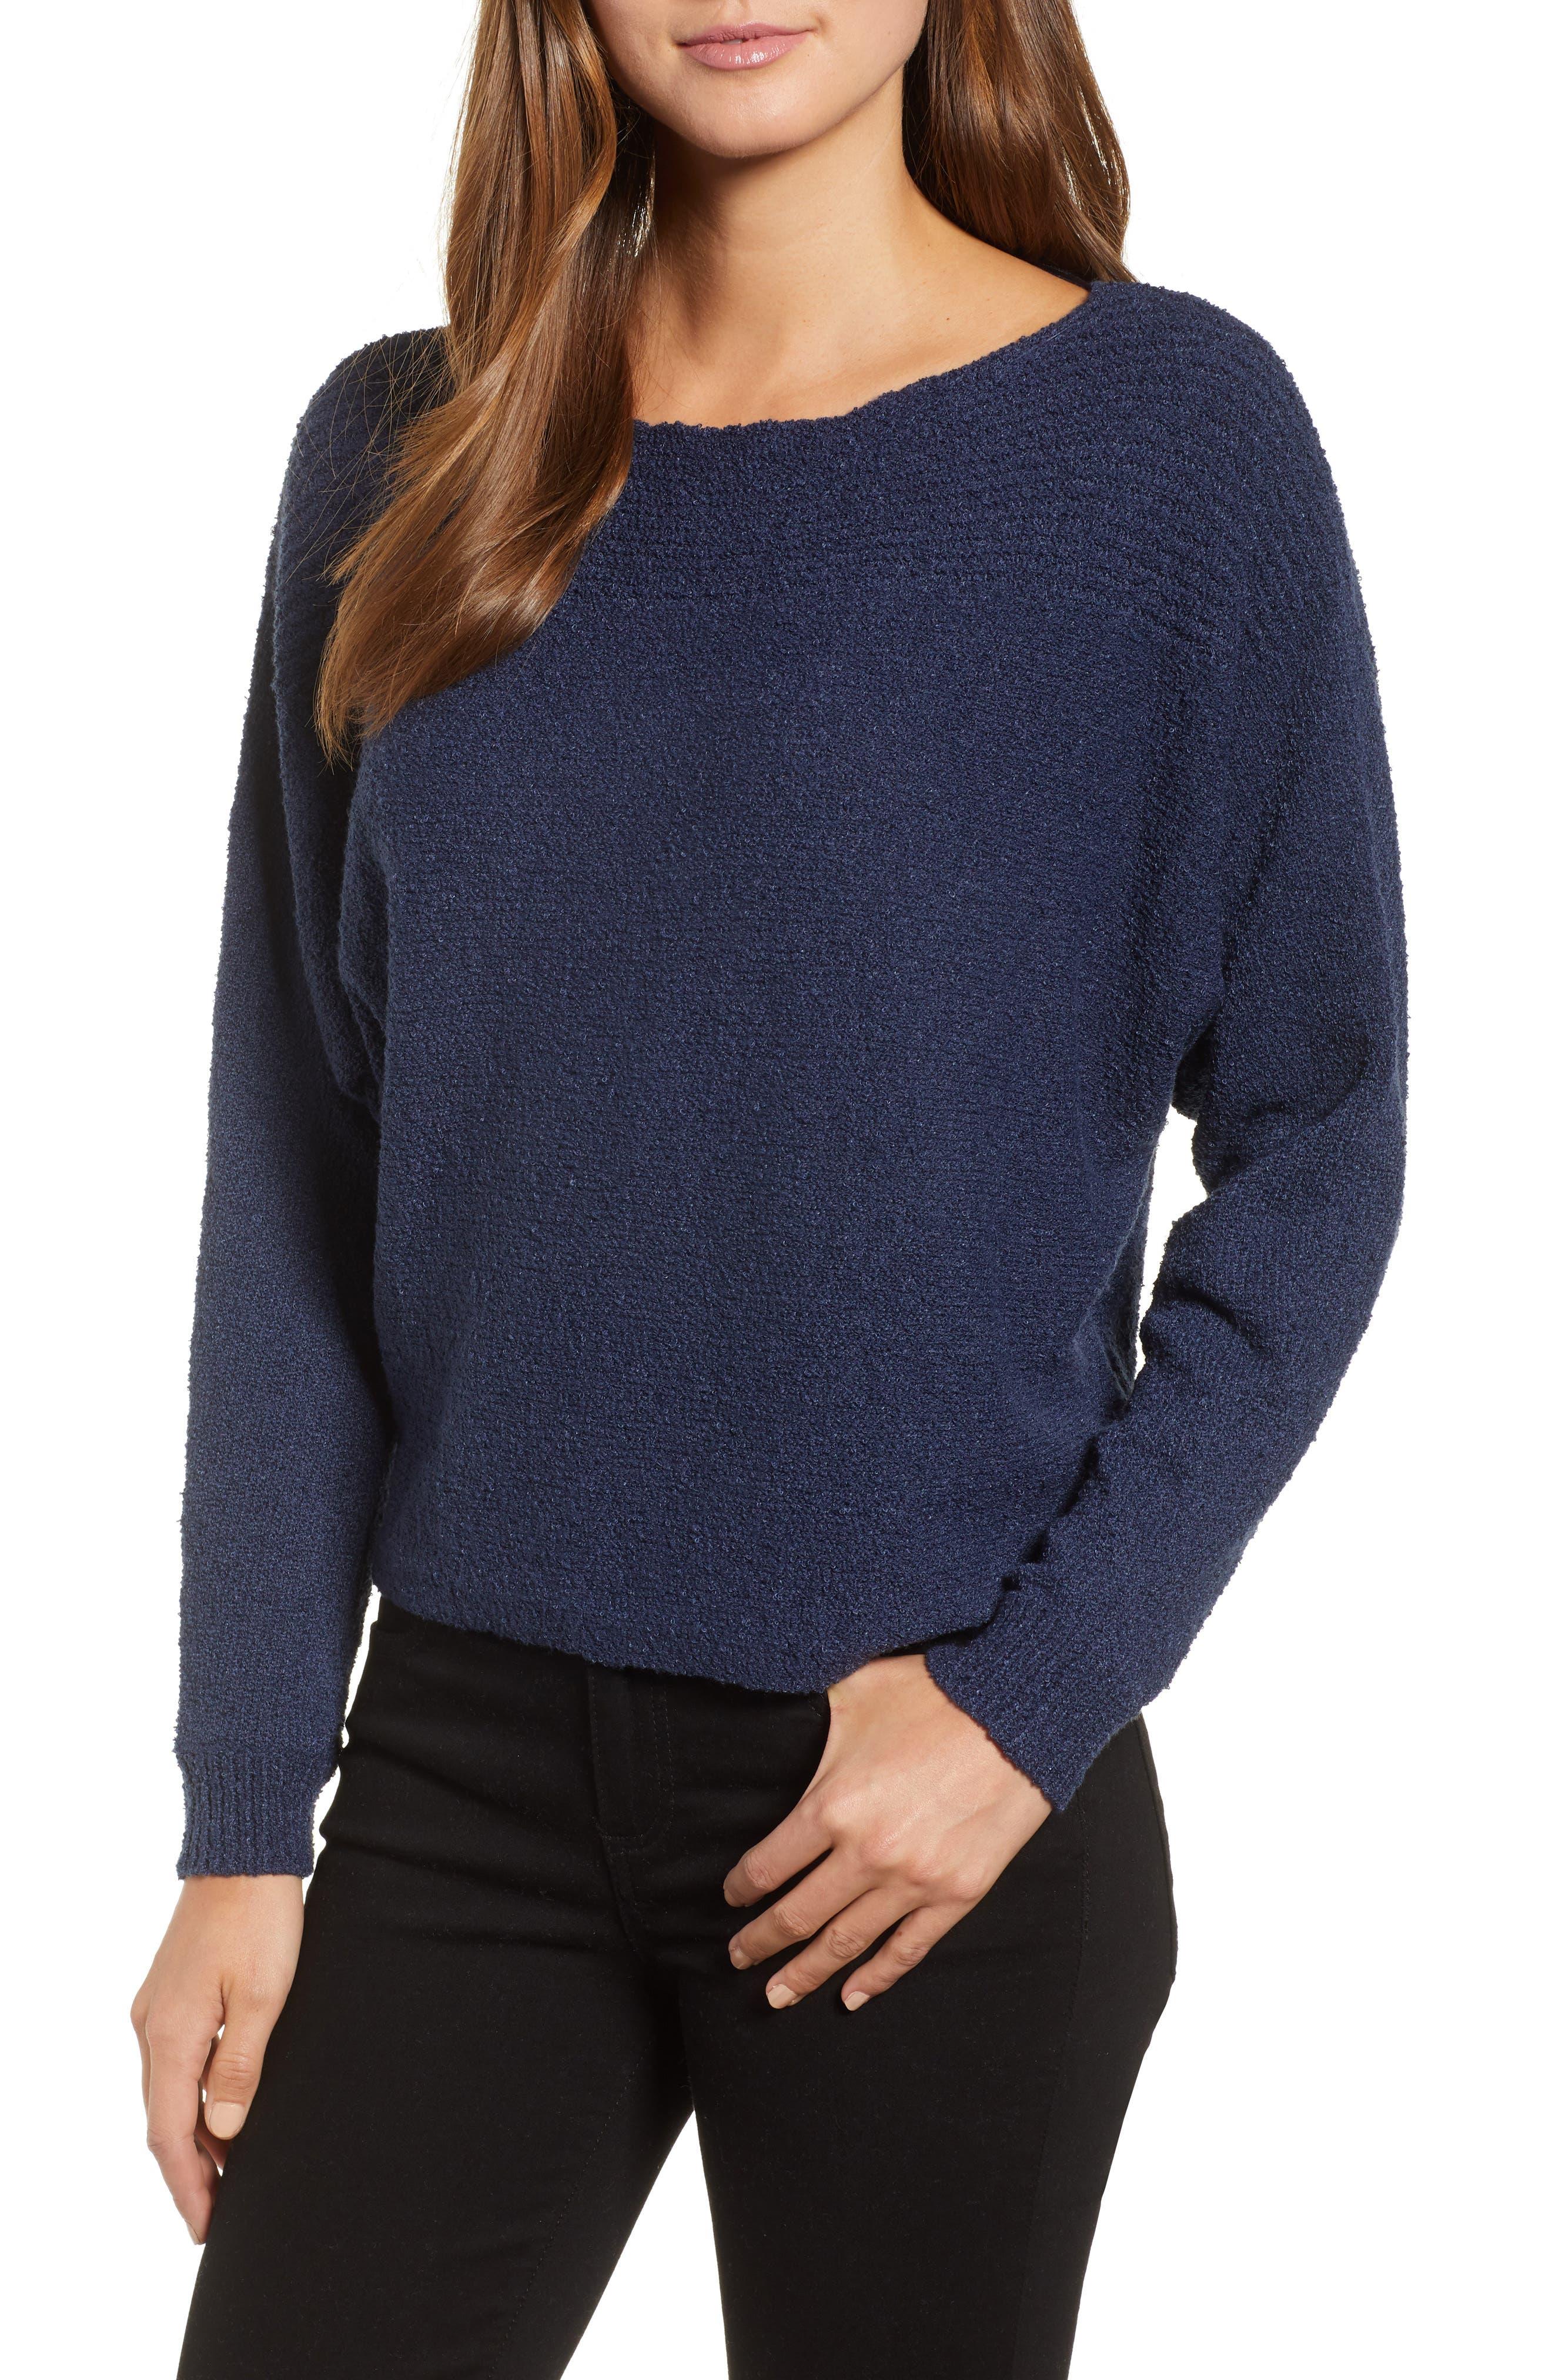 Calson<sup>®</sup> Dolman Sleeve Sweater,                         Main,                         color, Navy Indigo